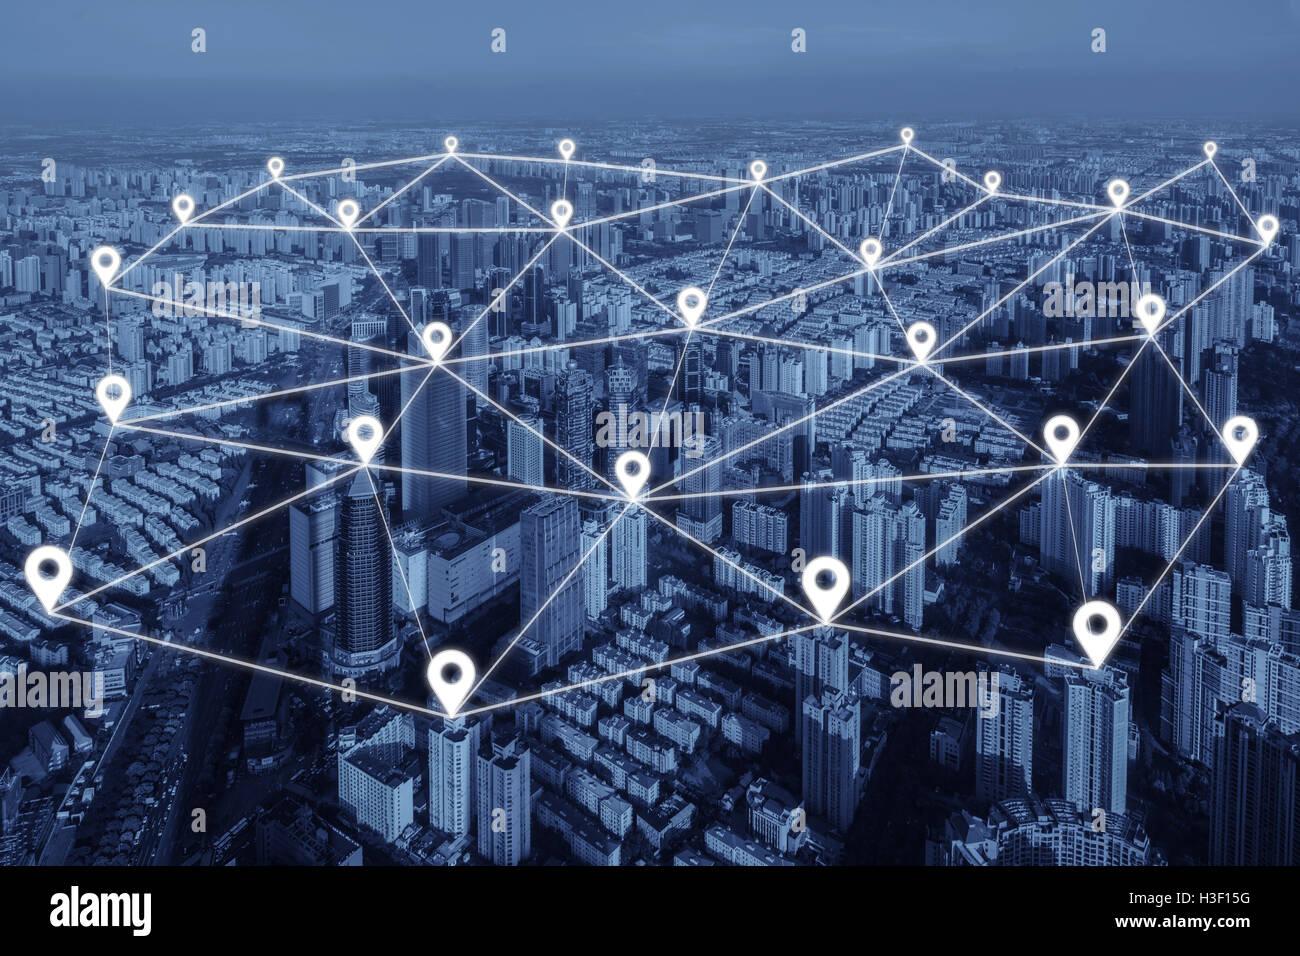 Karte-Pin flach der Netzwerkverbindung in Stadt. Netzwerk-Verbindung-Konzept. Stockbild